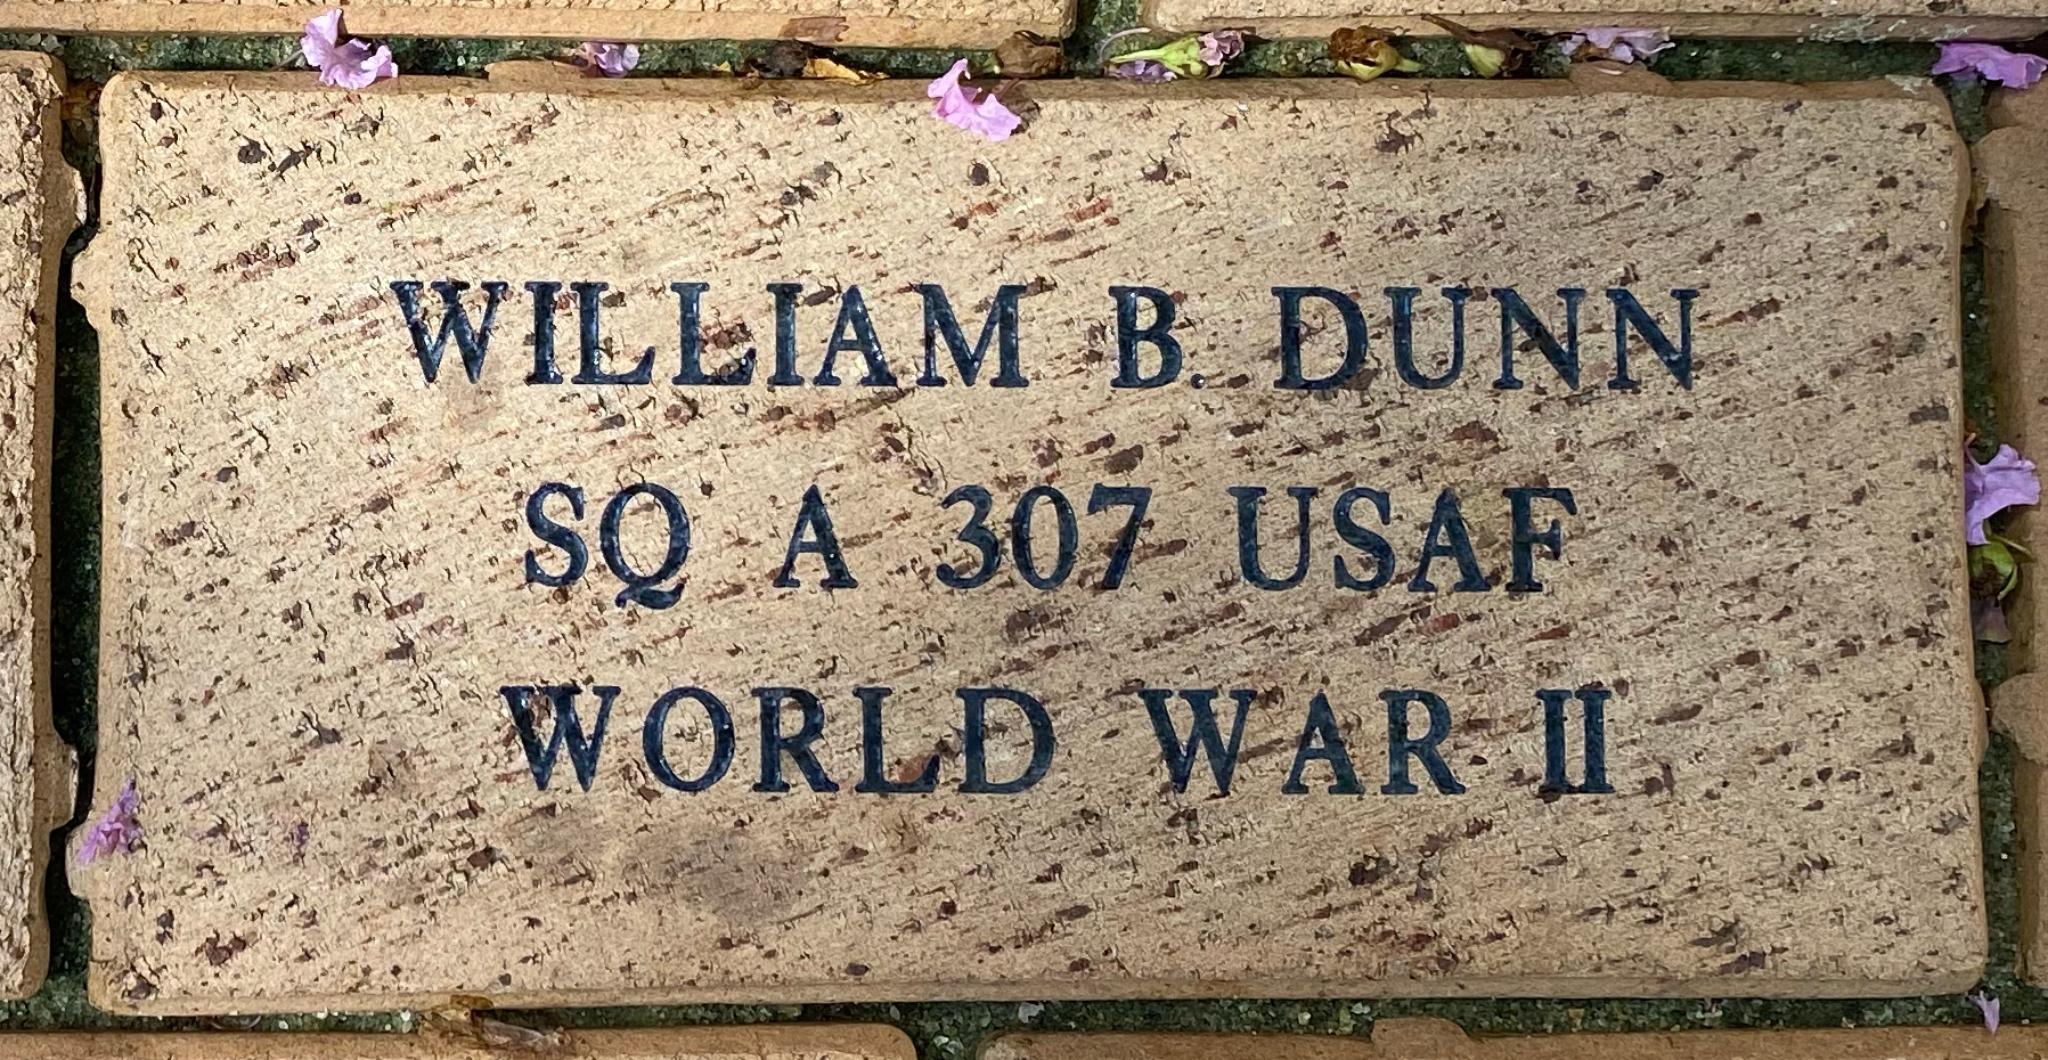 WILLIAM B DUNN SQ A 307 USAF WORLD WAR II